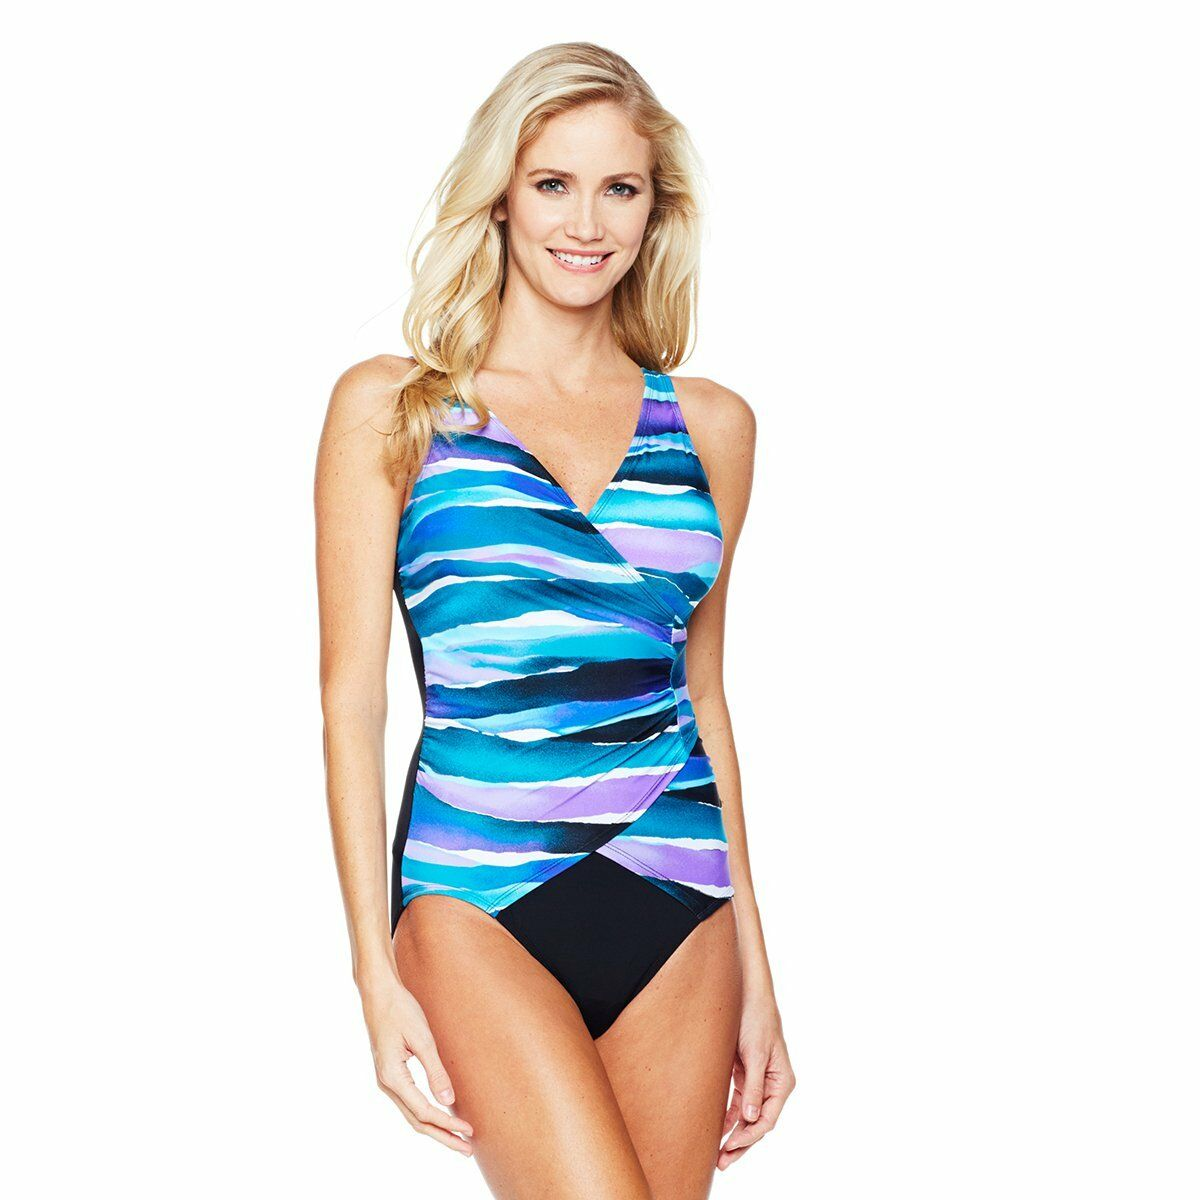 94.00 Jantzen® Royal Waves Surplice Swimsuit 356364J NOW ONLY  56